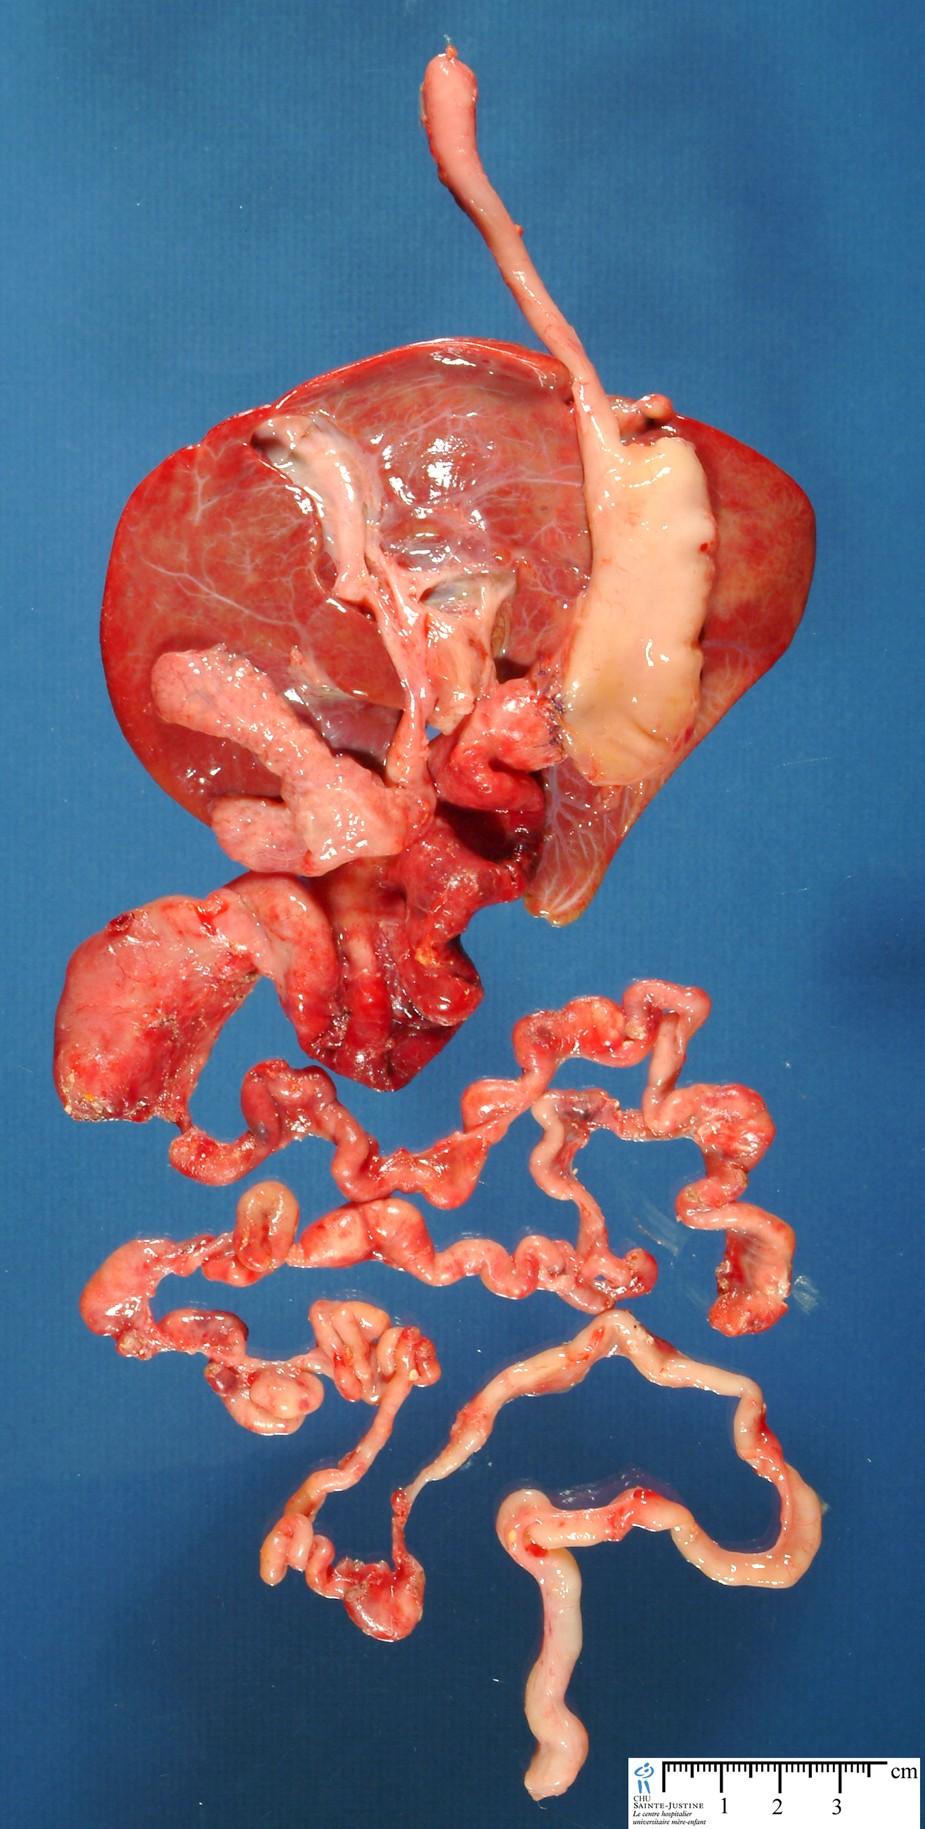 Case 12697 Multiple Intestinal Atresia Syndrome